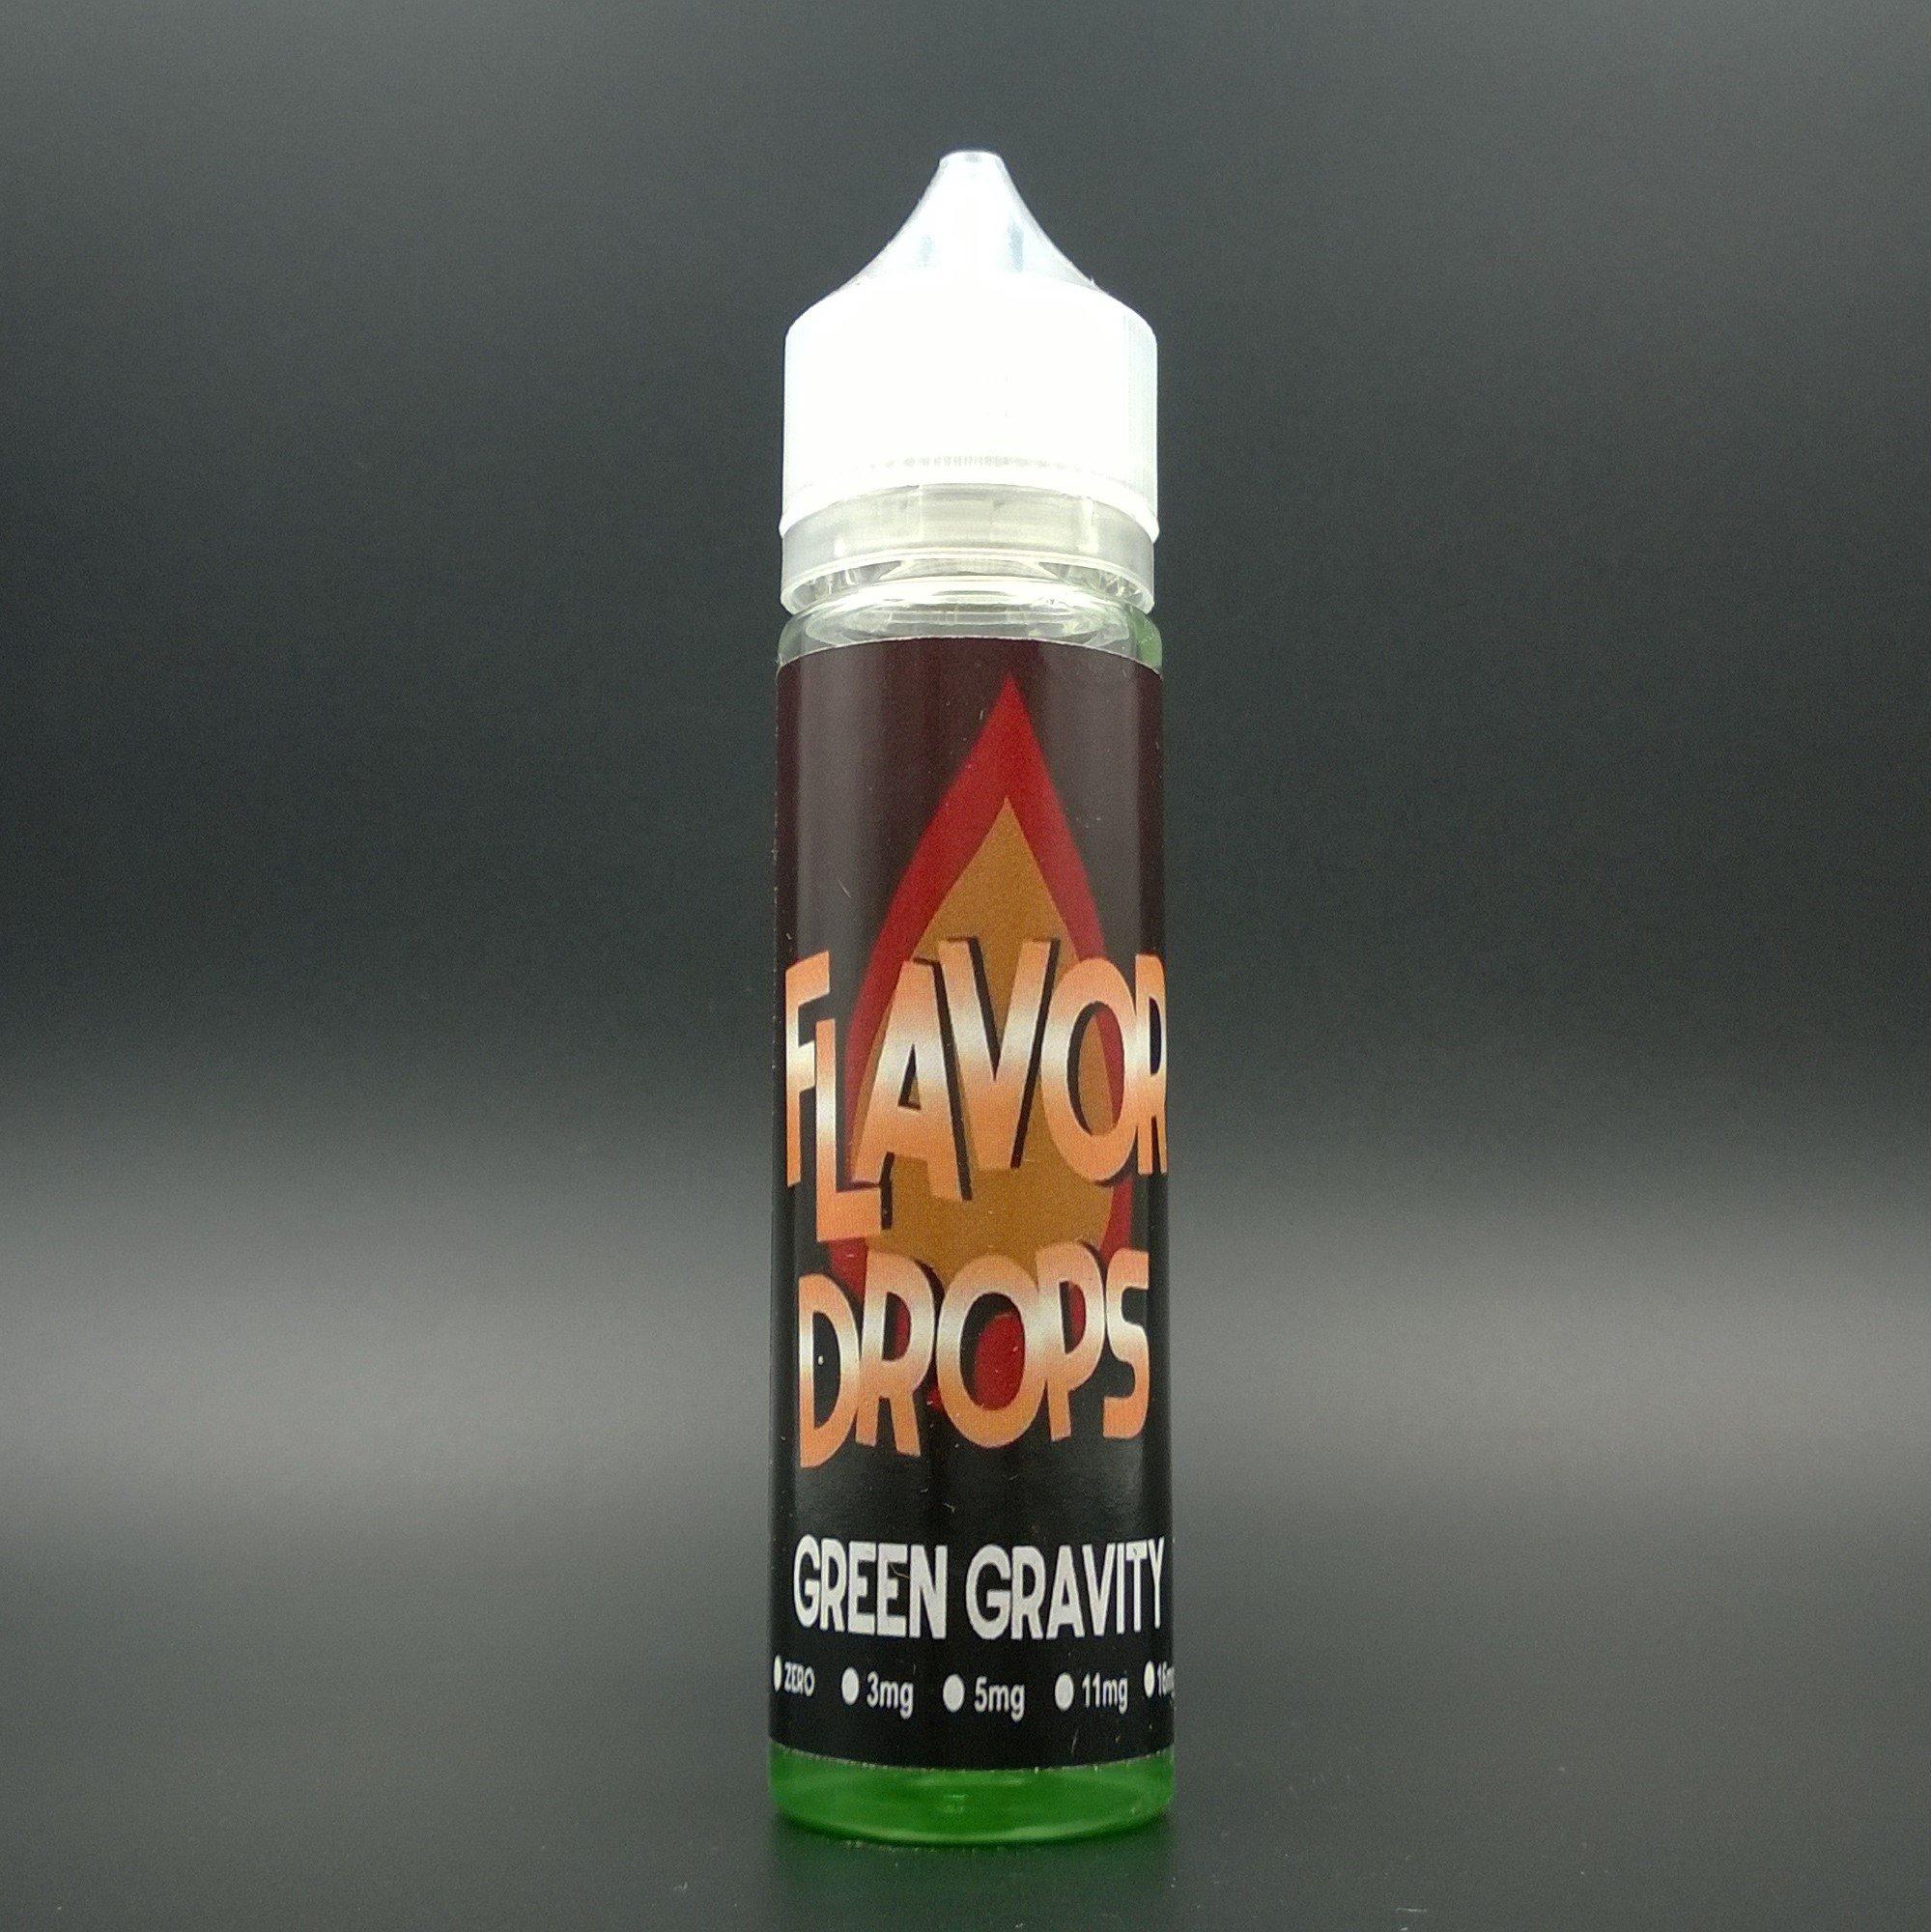 Green Gravity 50ml - Flavor Drops